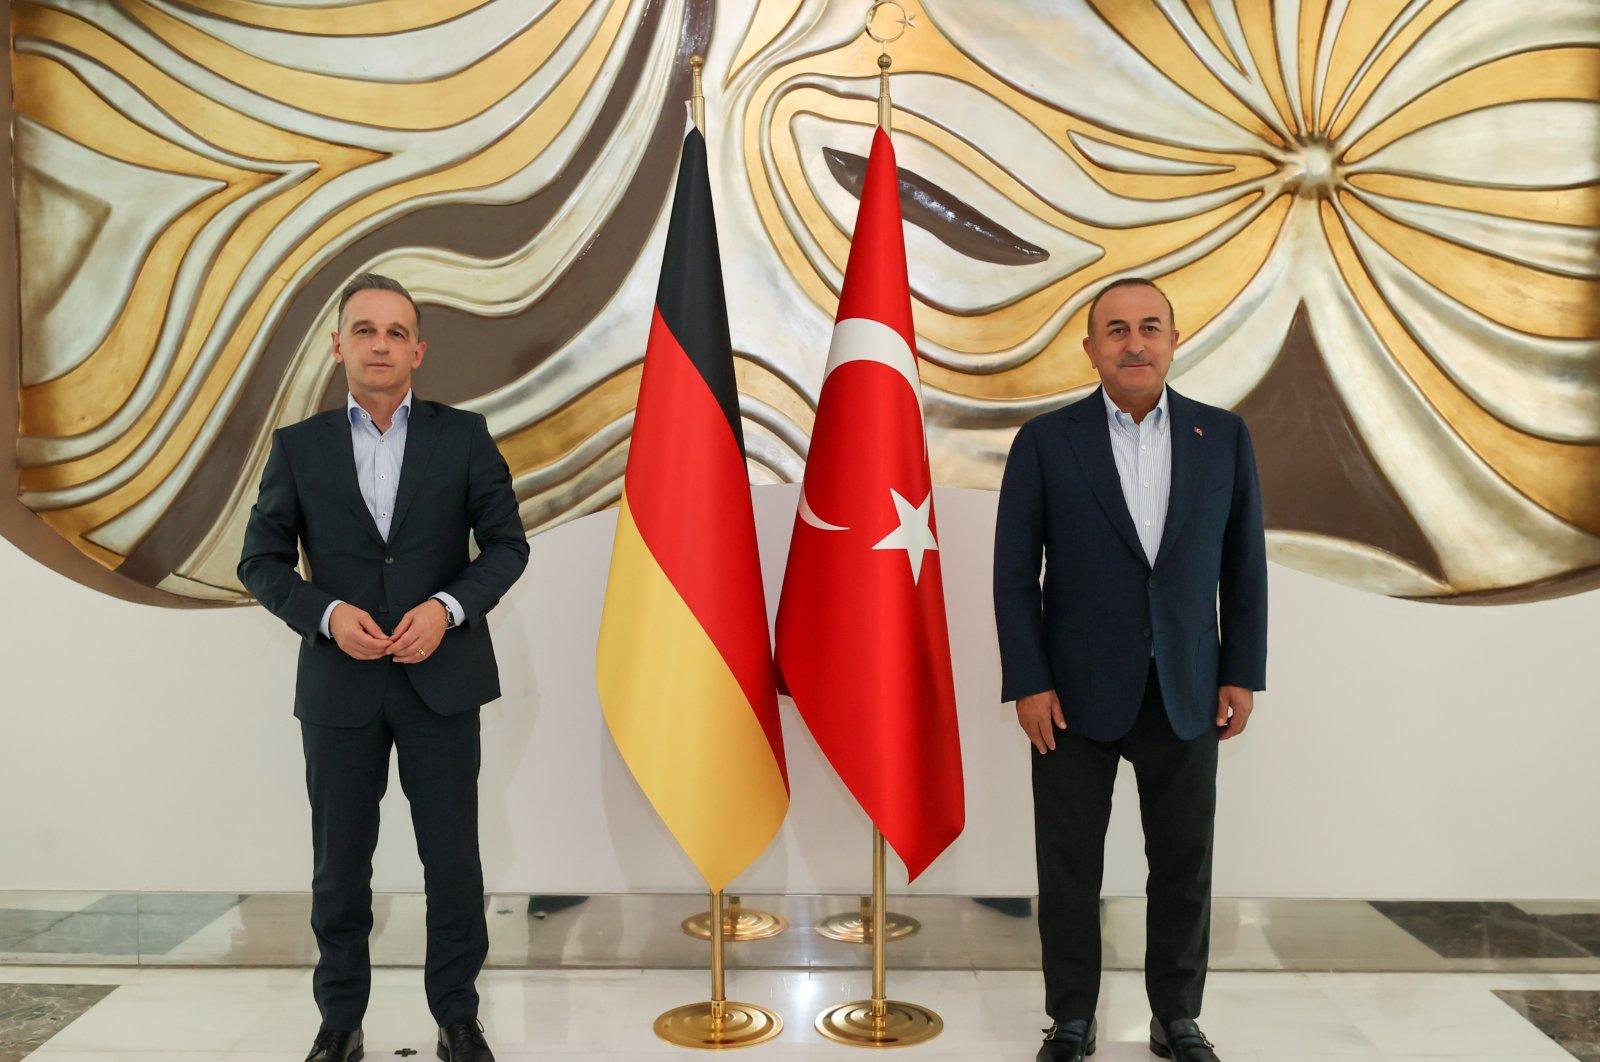 Foreign Minister Mevlüt Çavuşoğlu (right) with German Foreign Minister Heiko Maas in Antalya, Turkey, Aug. 29, 2021. (AA Photo)